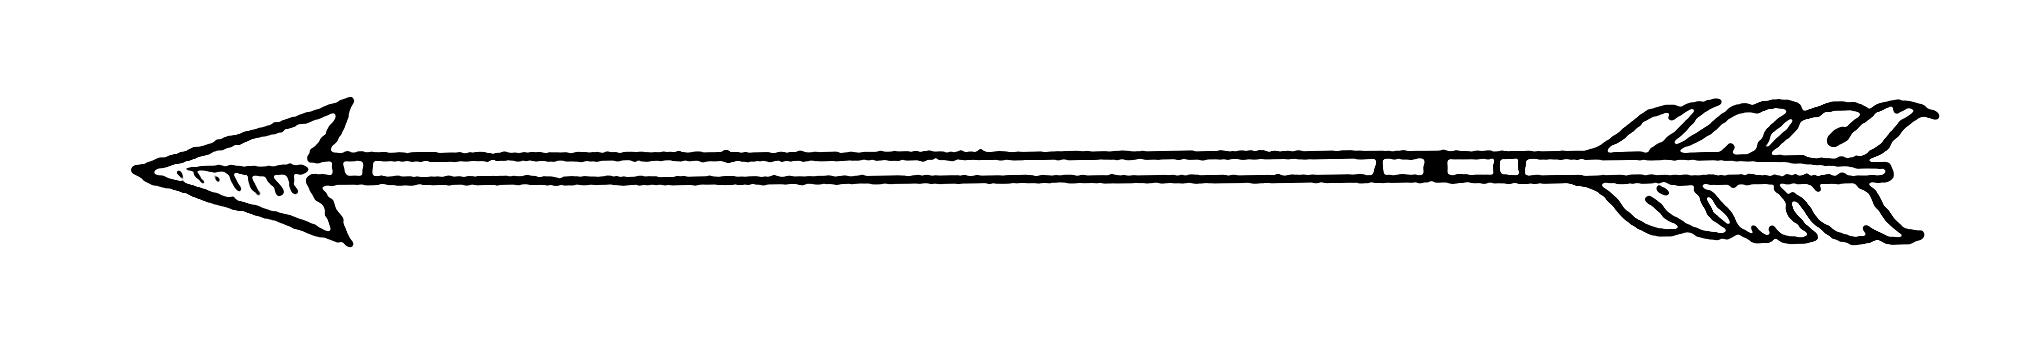 Line Art Arrow : File arrow psf wikimedia commons